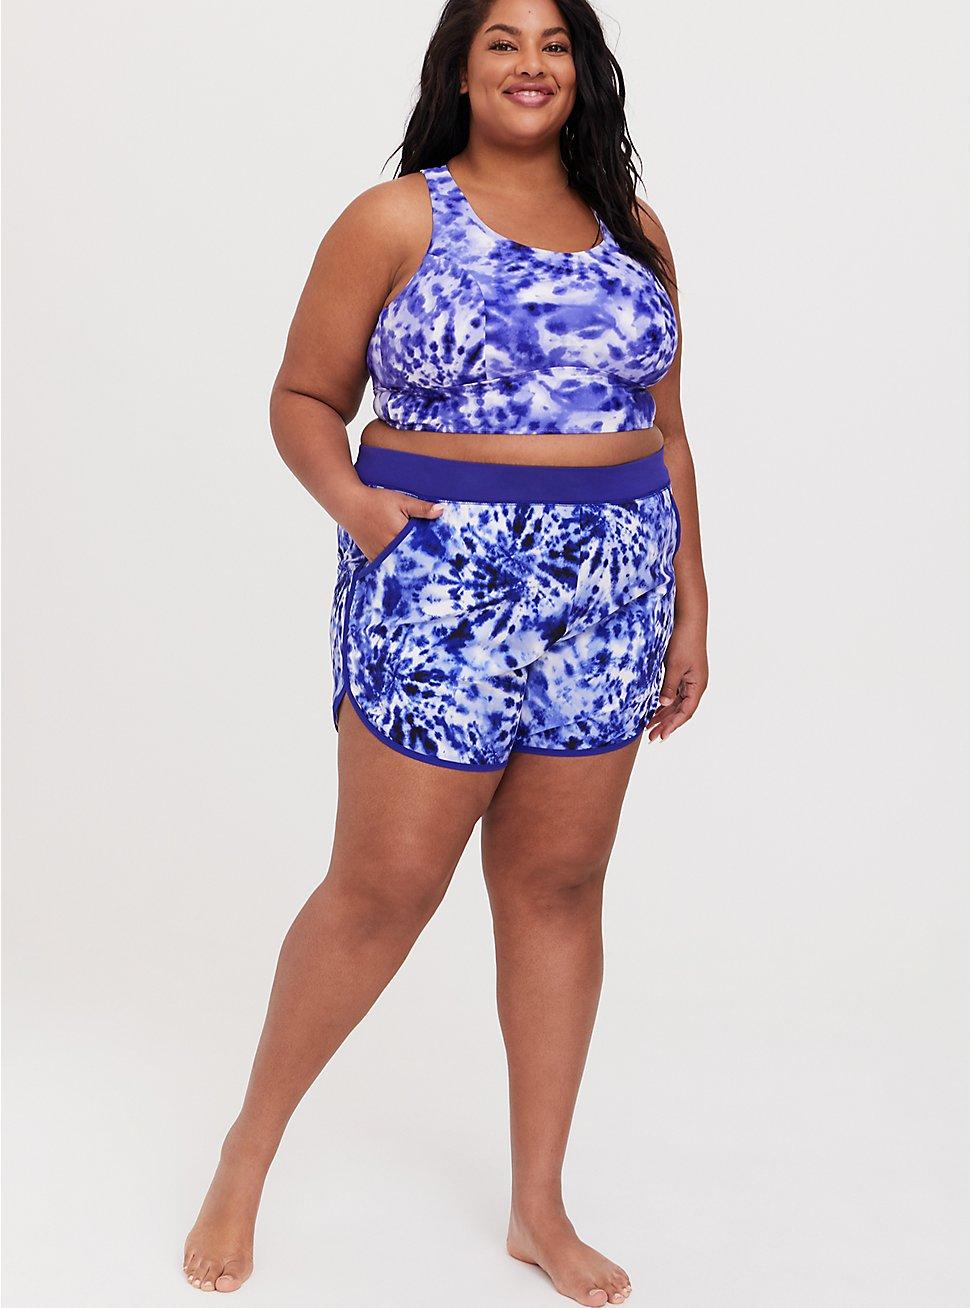 Blue Tie Dye Bikini and Short Set, , hi-res